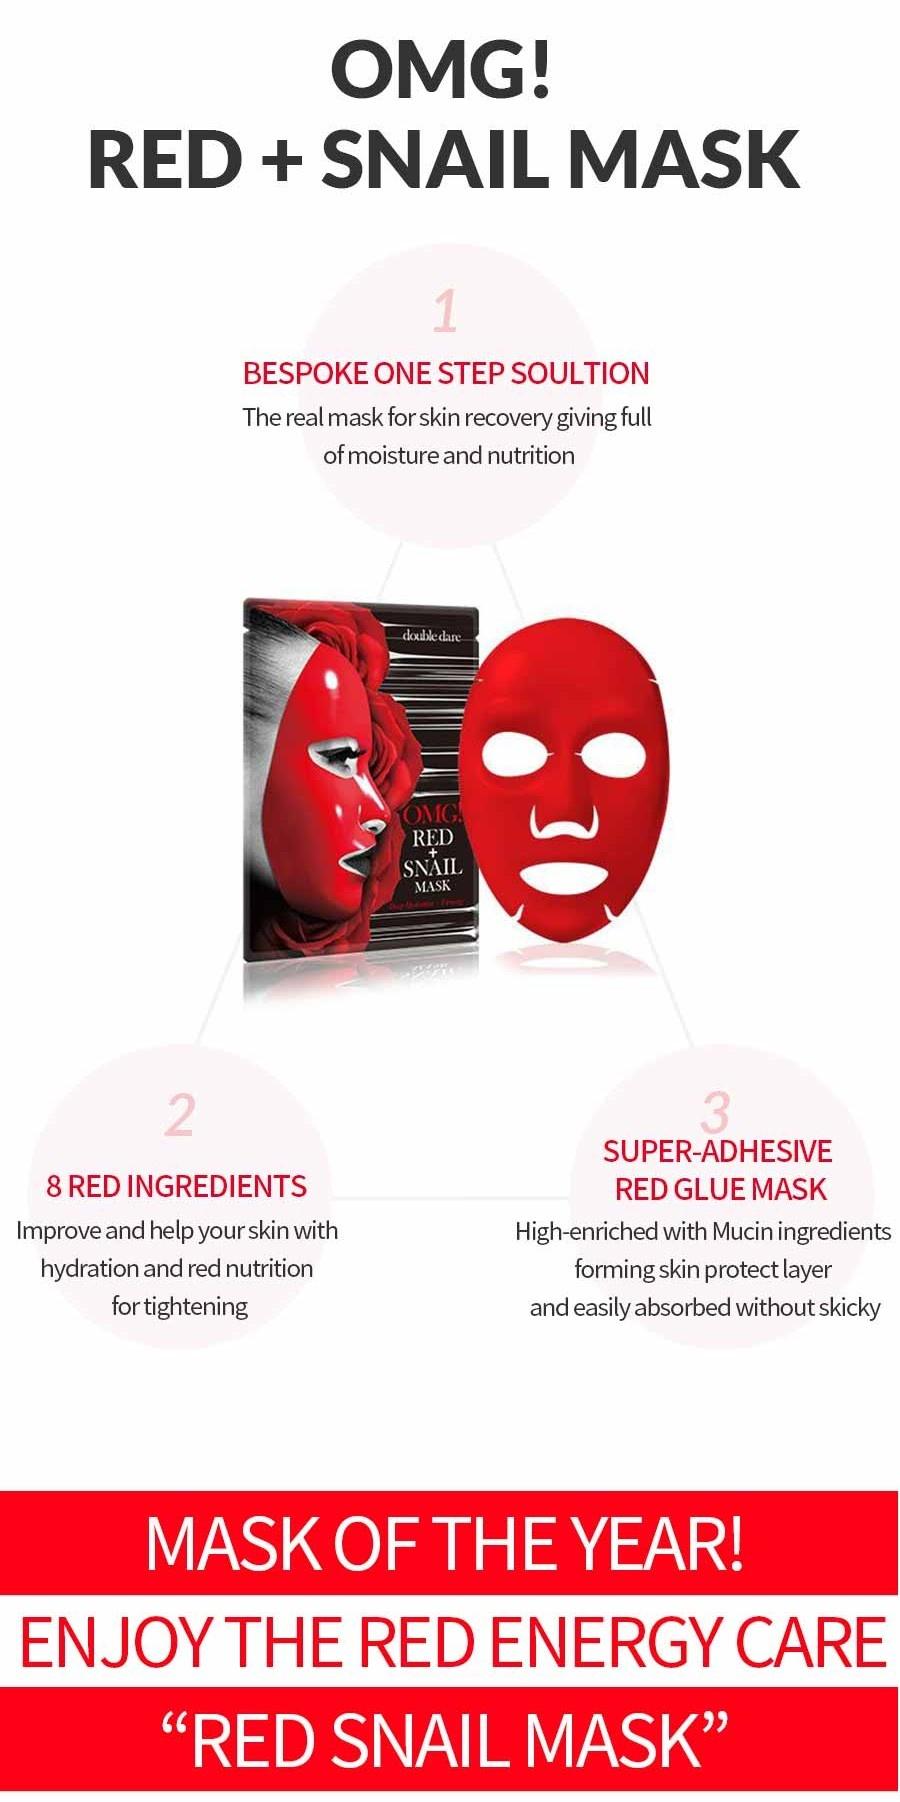 OMG! Red + Snail Mask Sheet-4